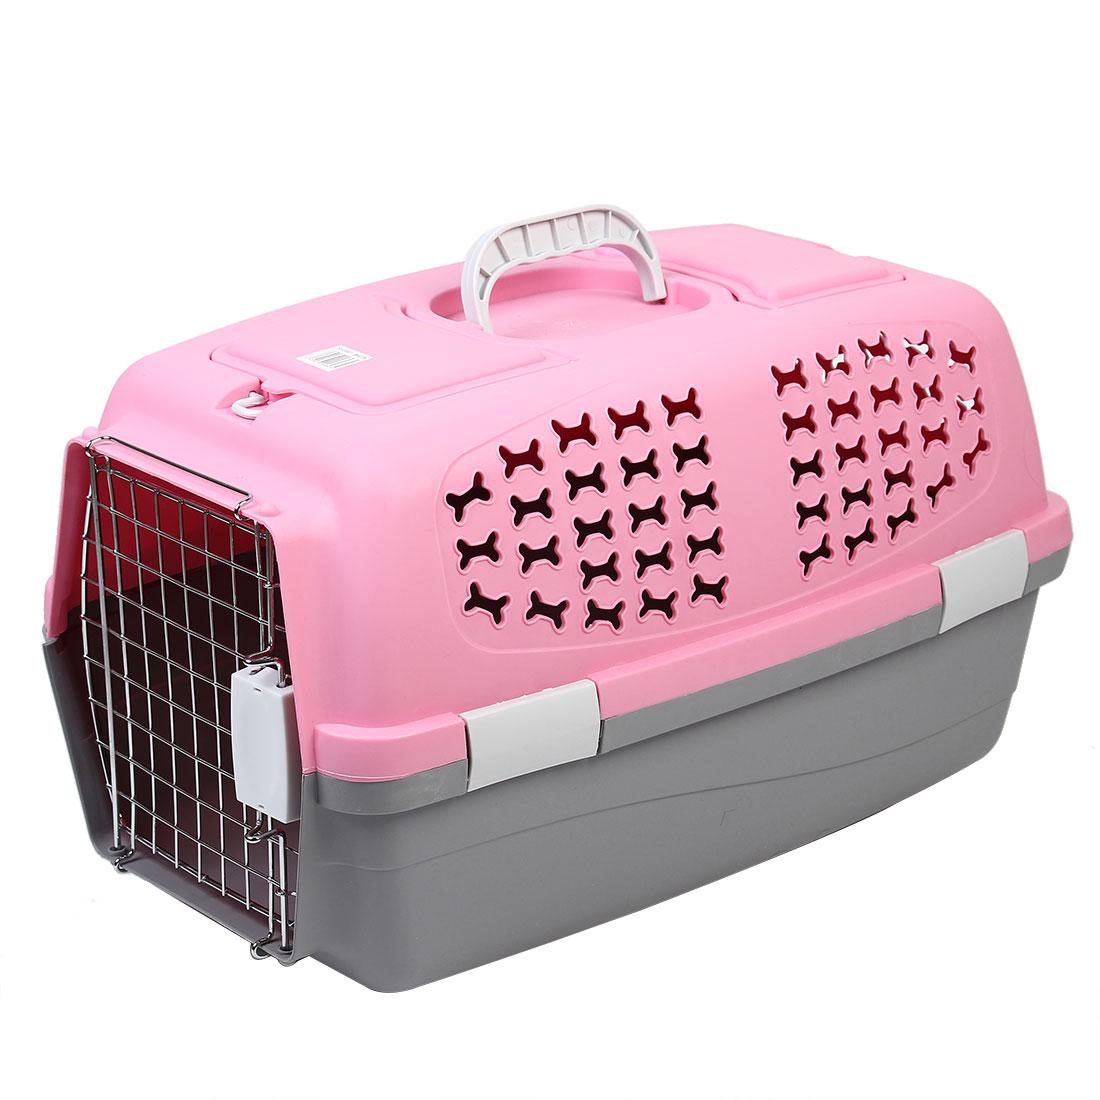 Travel Portable Plastic Transport Cages Airways Box Pet Carrier Pink 54x35x35cm